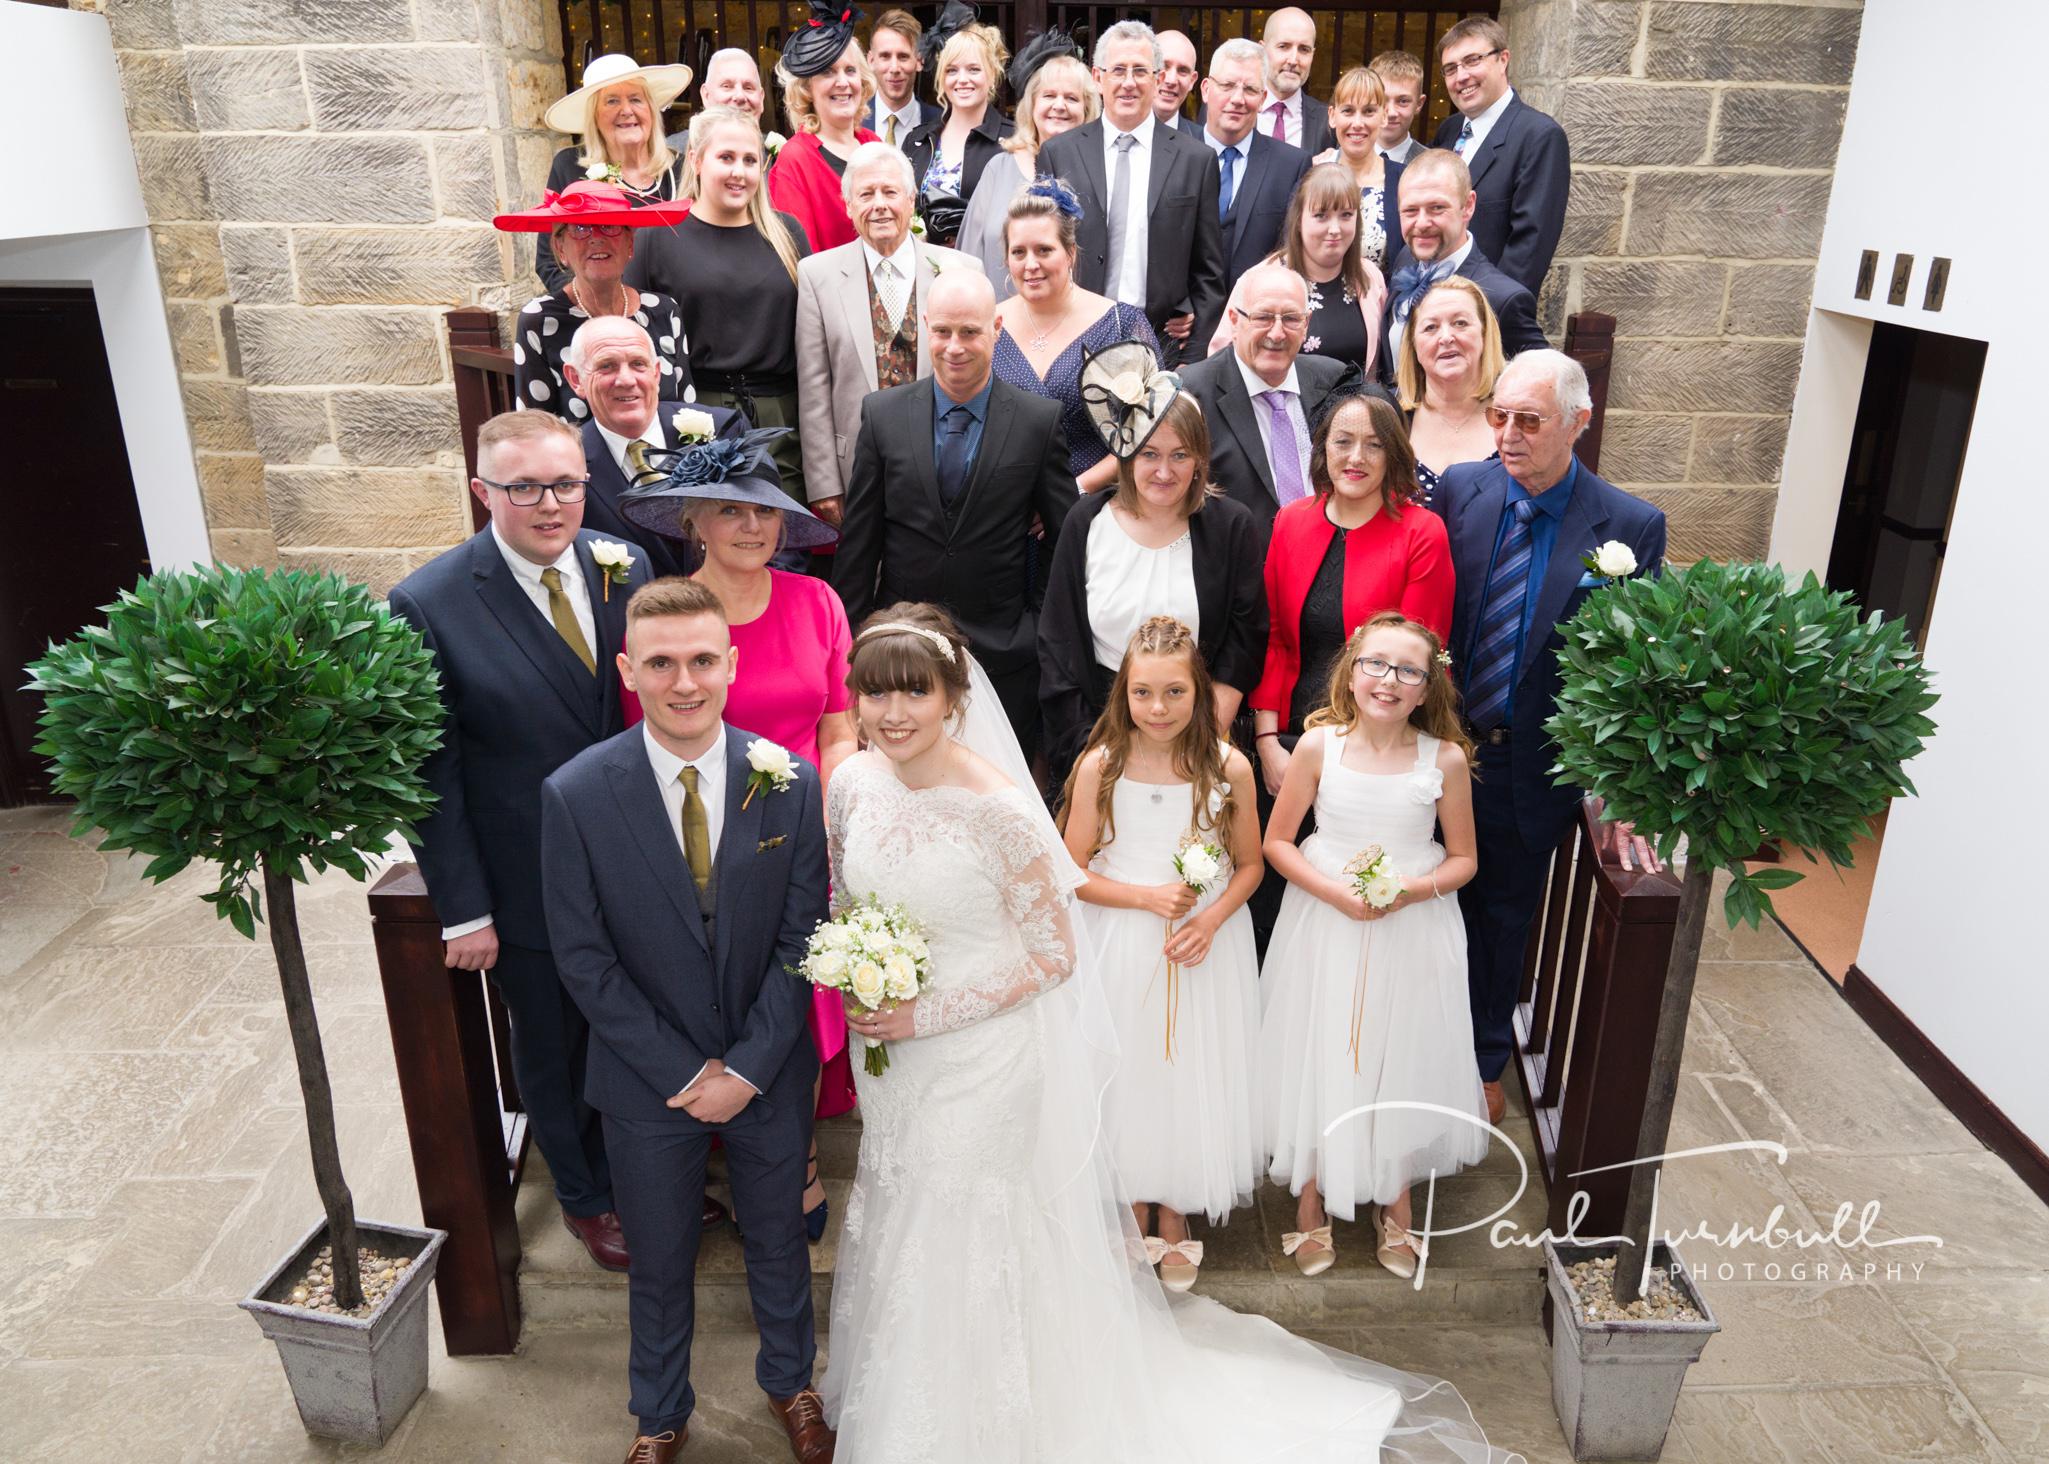 Full wedding group shot at Raven Hall, Ravenscar